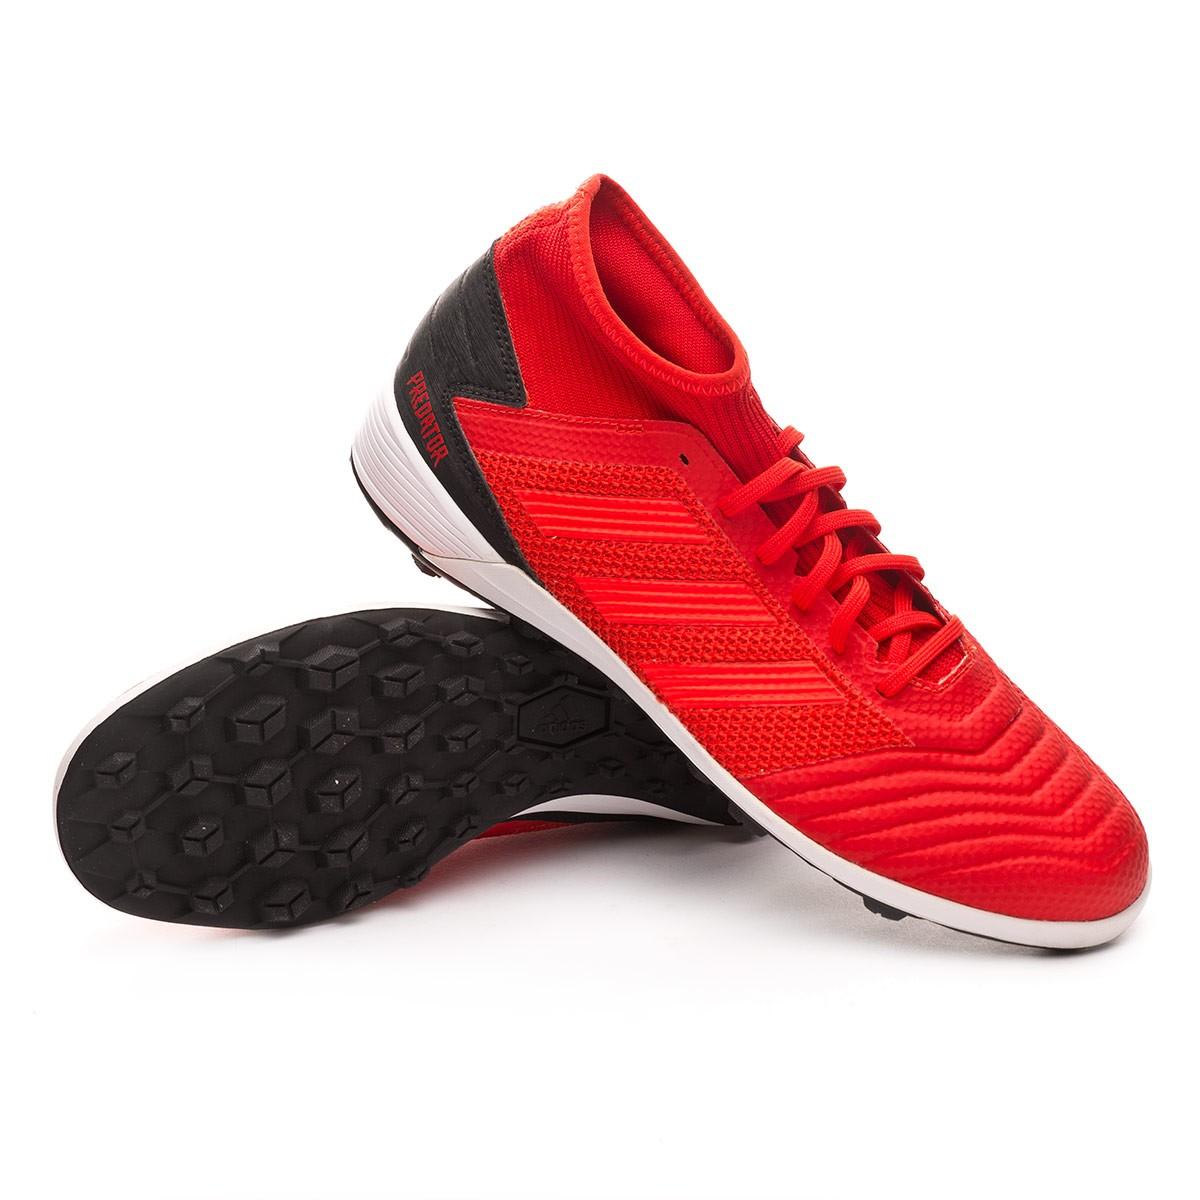 e8cbb4ab47 Bambini Adidas Predator Tango Scarpe da Calcio Misura UK 2-4.5 Calcio